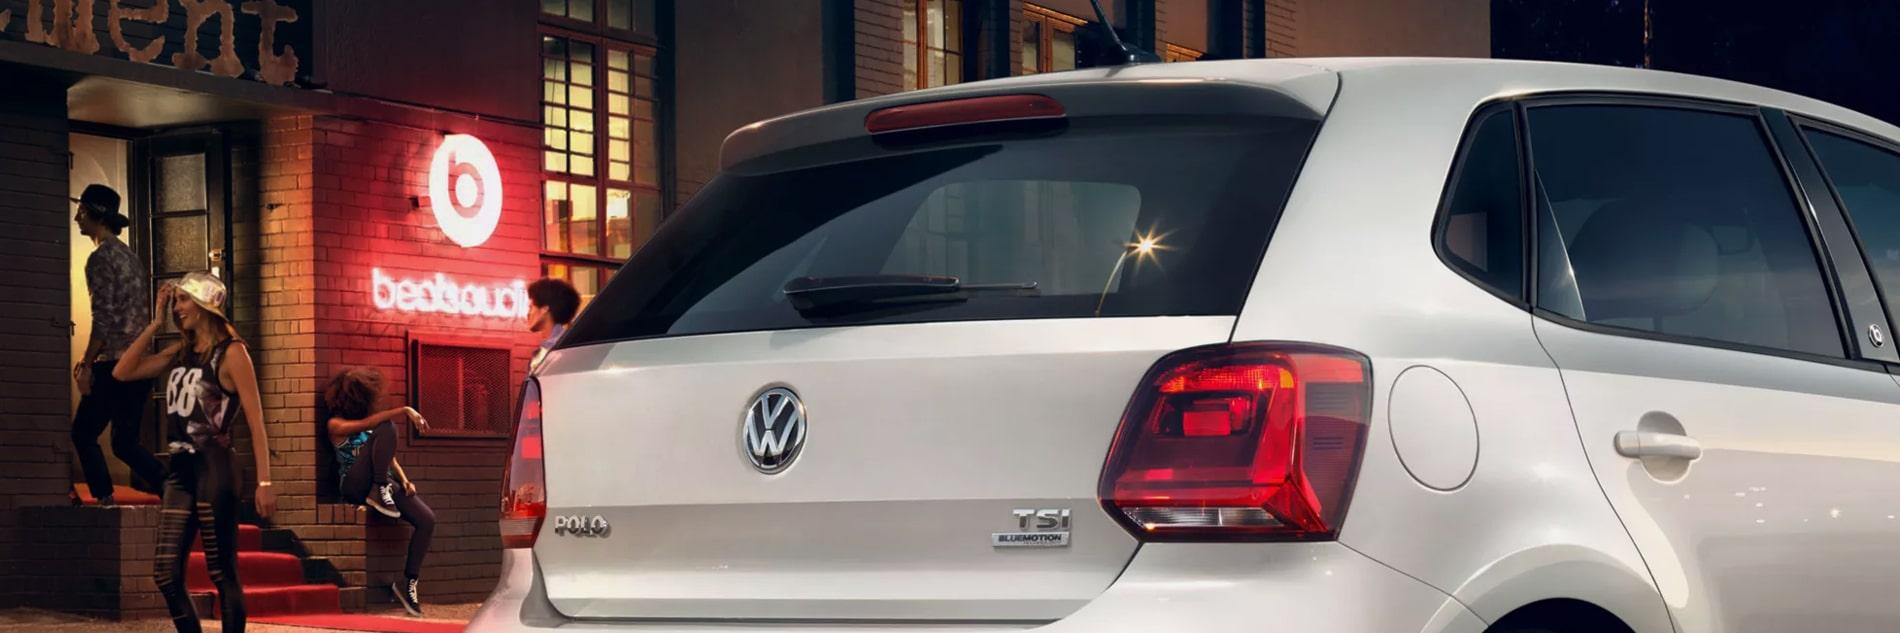 Volkswagen-paketa-service-economy-packs-1900x633